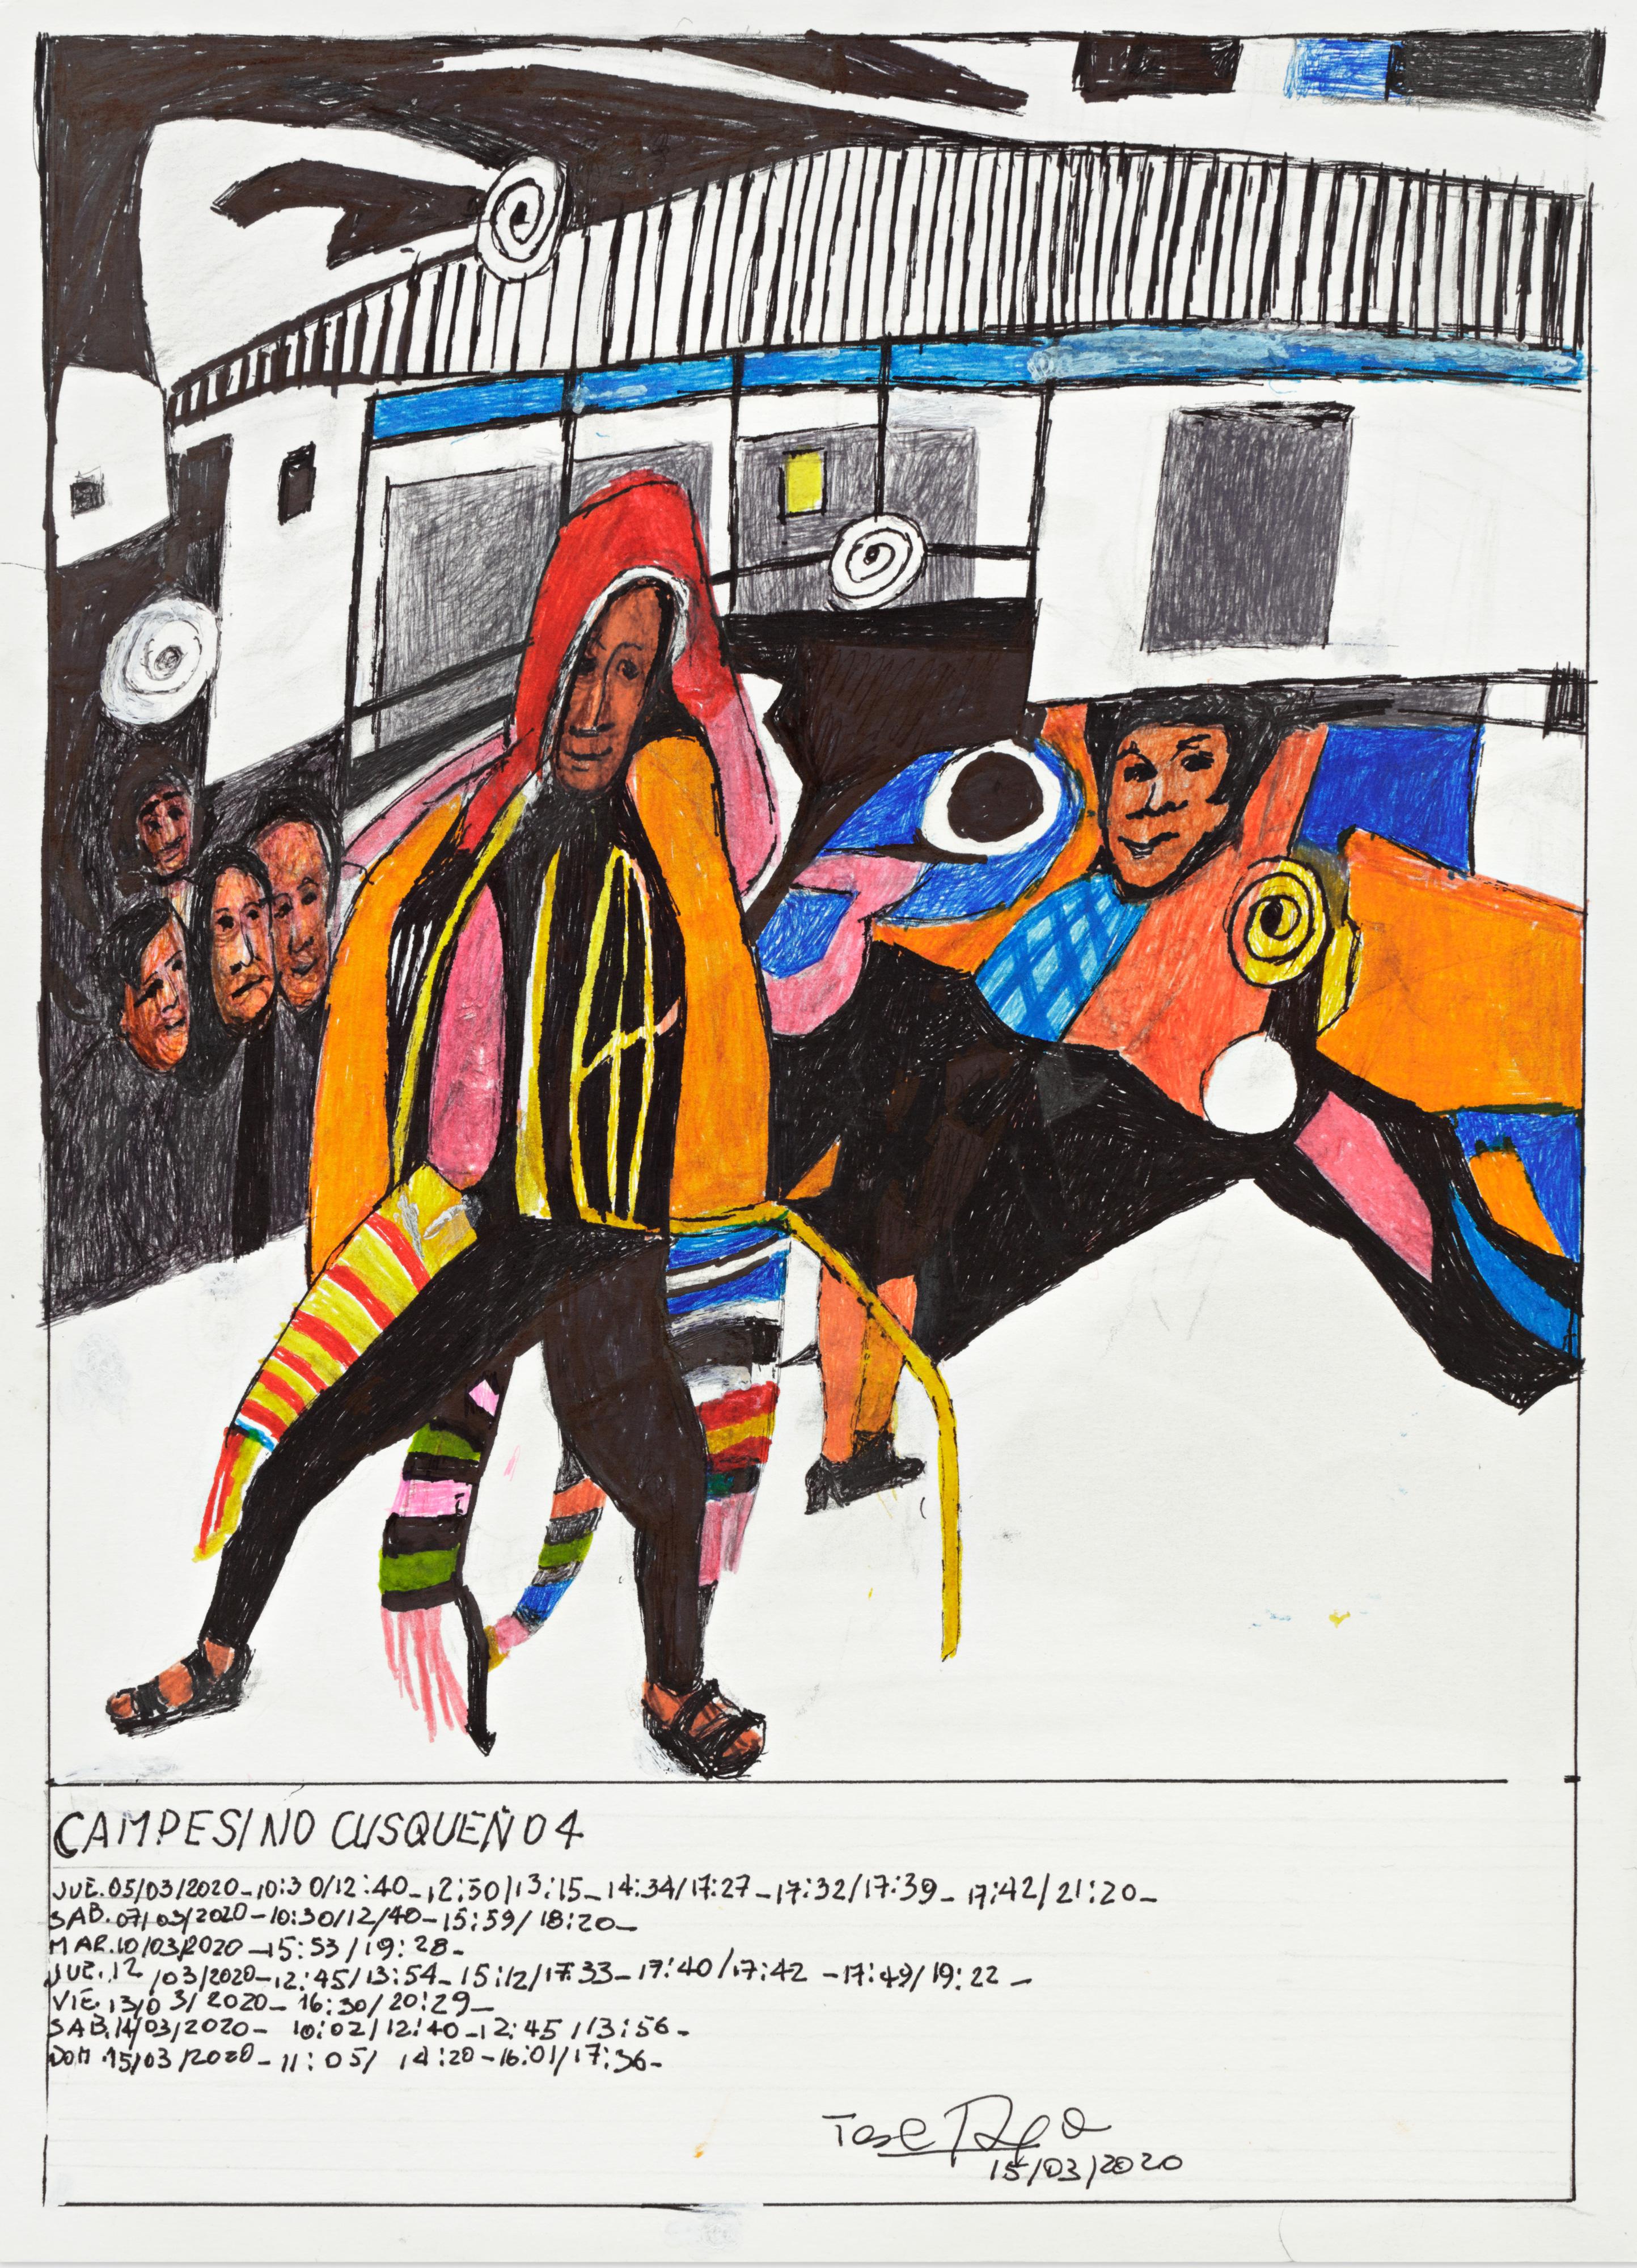 Galerie Barbara Thumm \ New Viewings #4 \ New Viewings #4